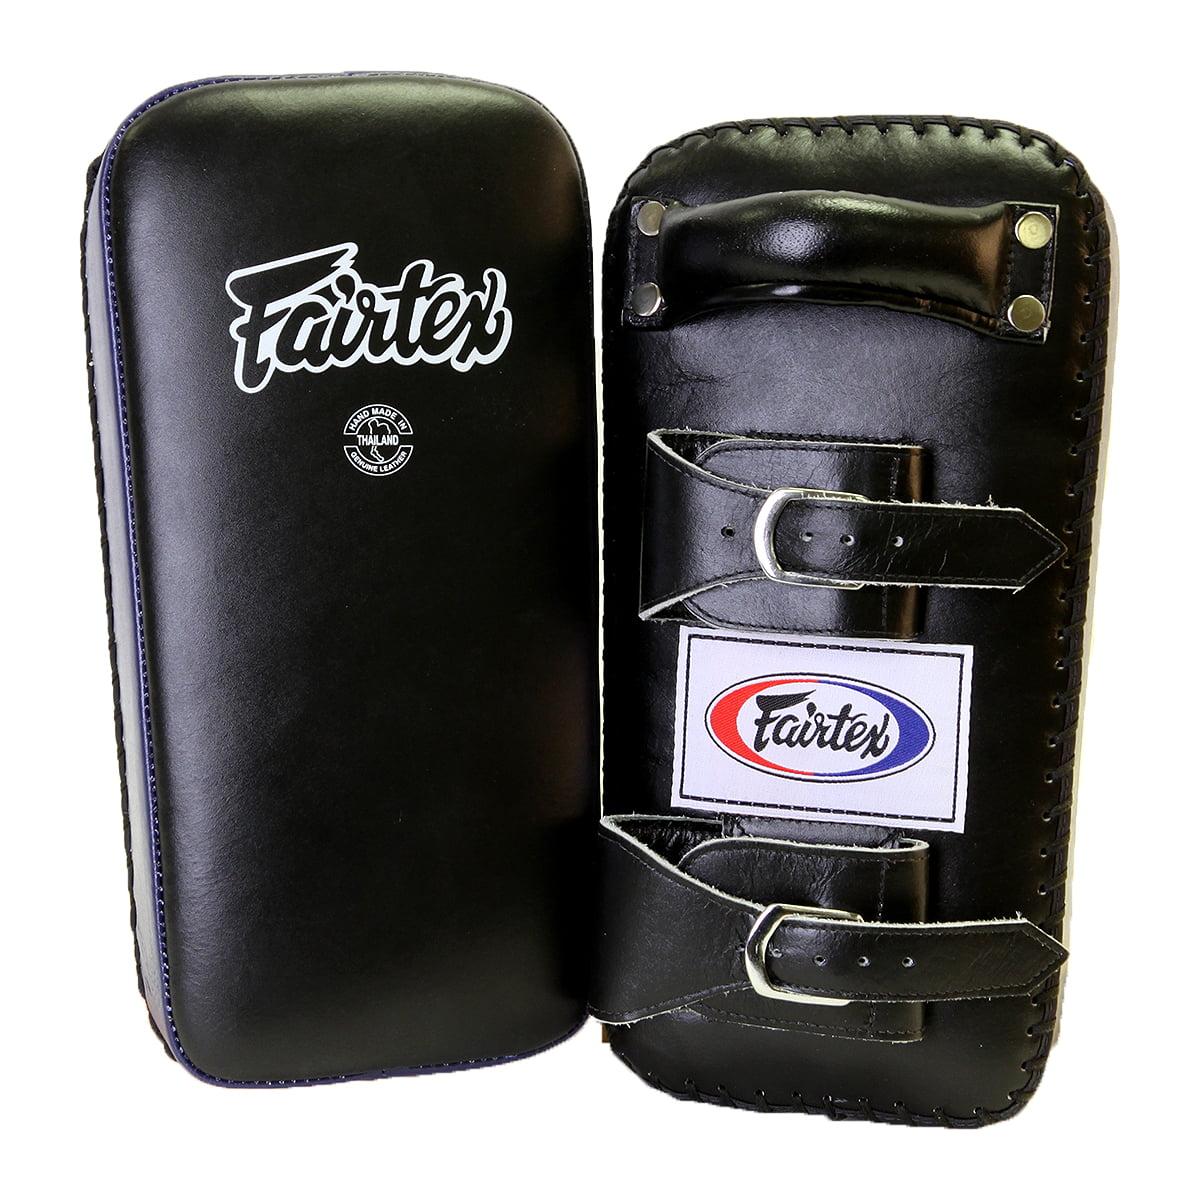 Fairtex Extra Long Thai Kick Pads with Buckle - Black/Blue